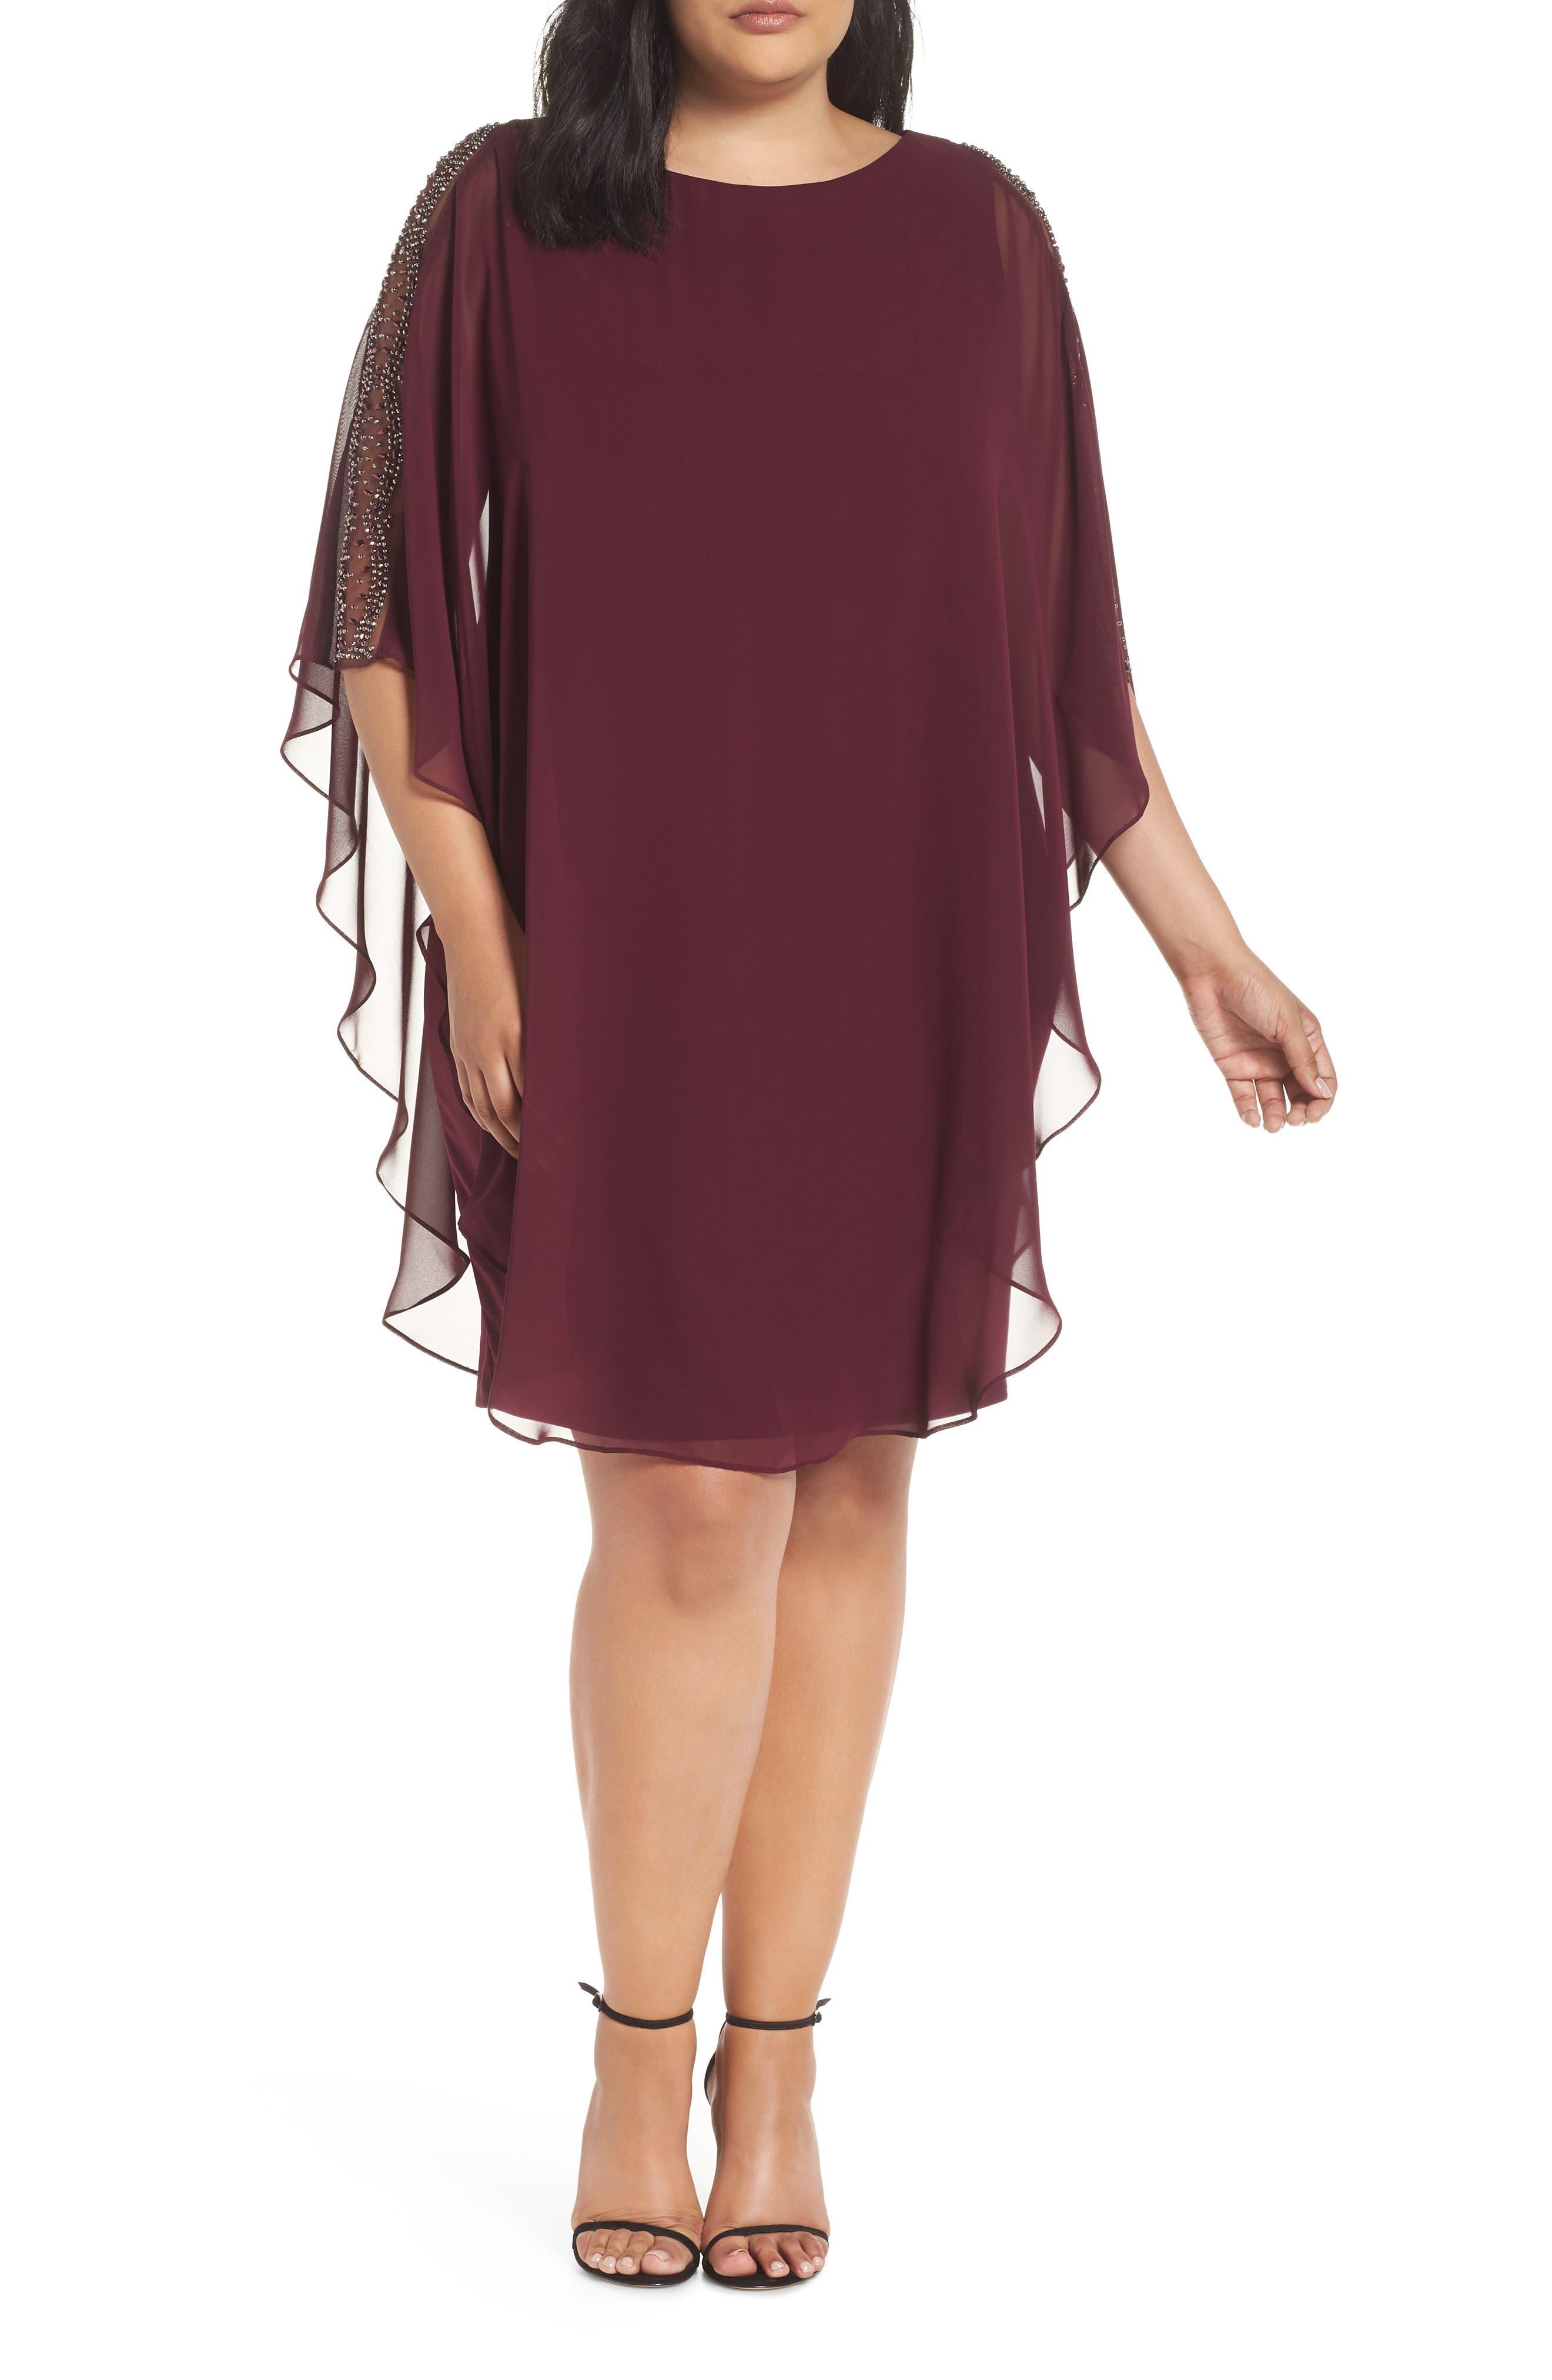 7d96c367 Plus Size Xscape Chiffon Overlay Beaded Sleeve Cocktail Dress